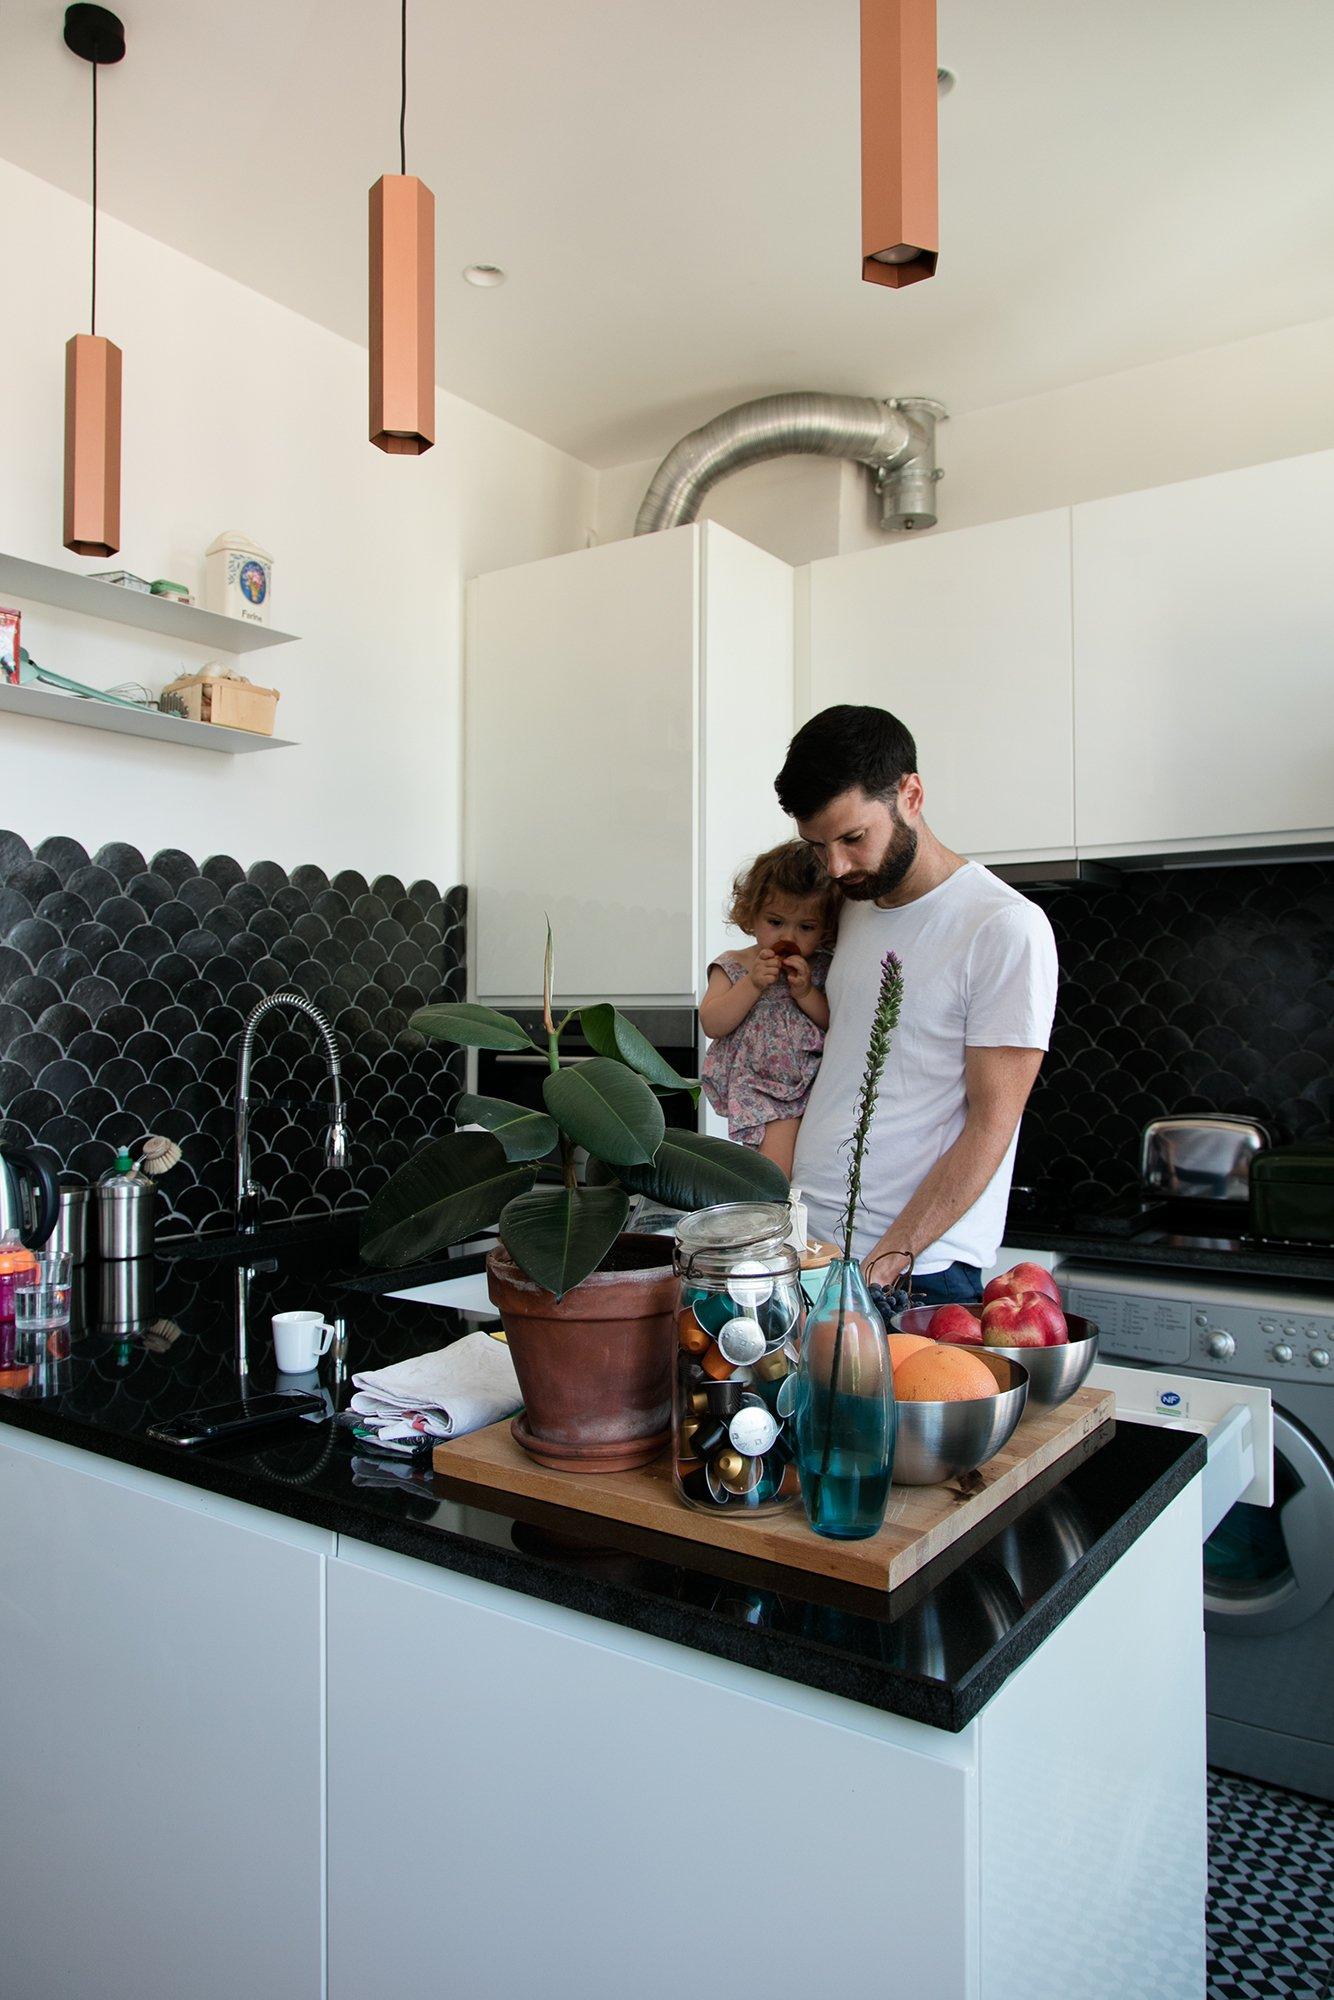 Cuisine Appartement Marseille Emma et Ghislain Borga